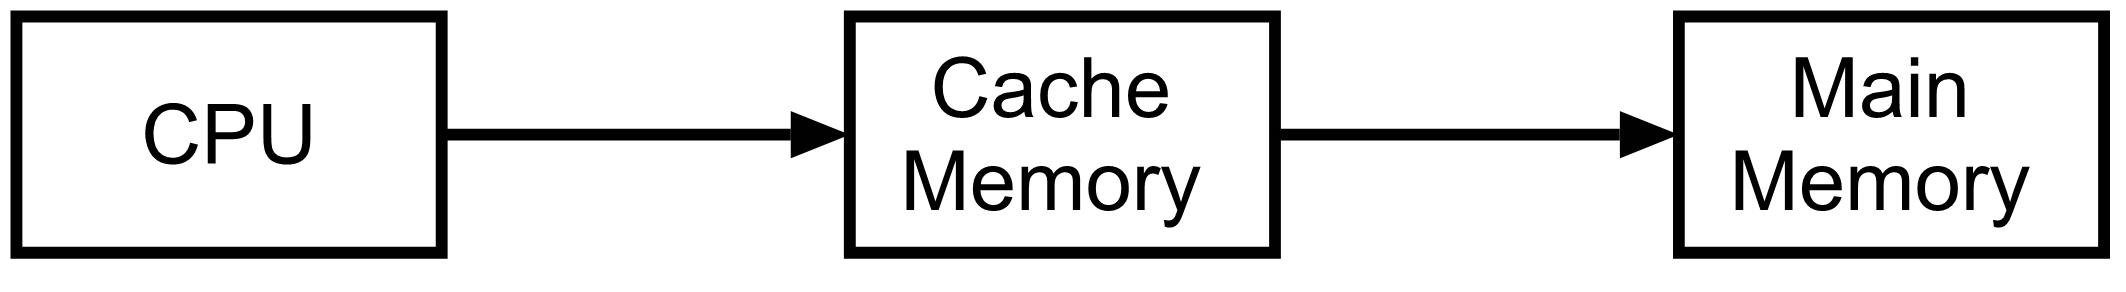 CacheMemory